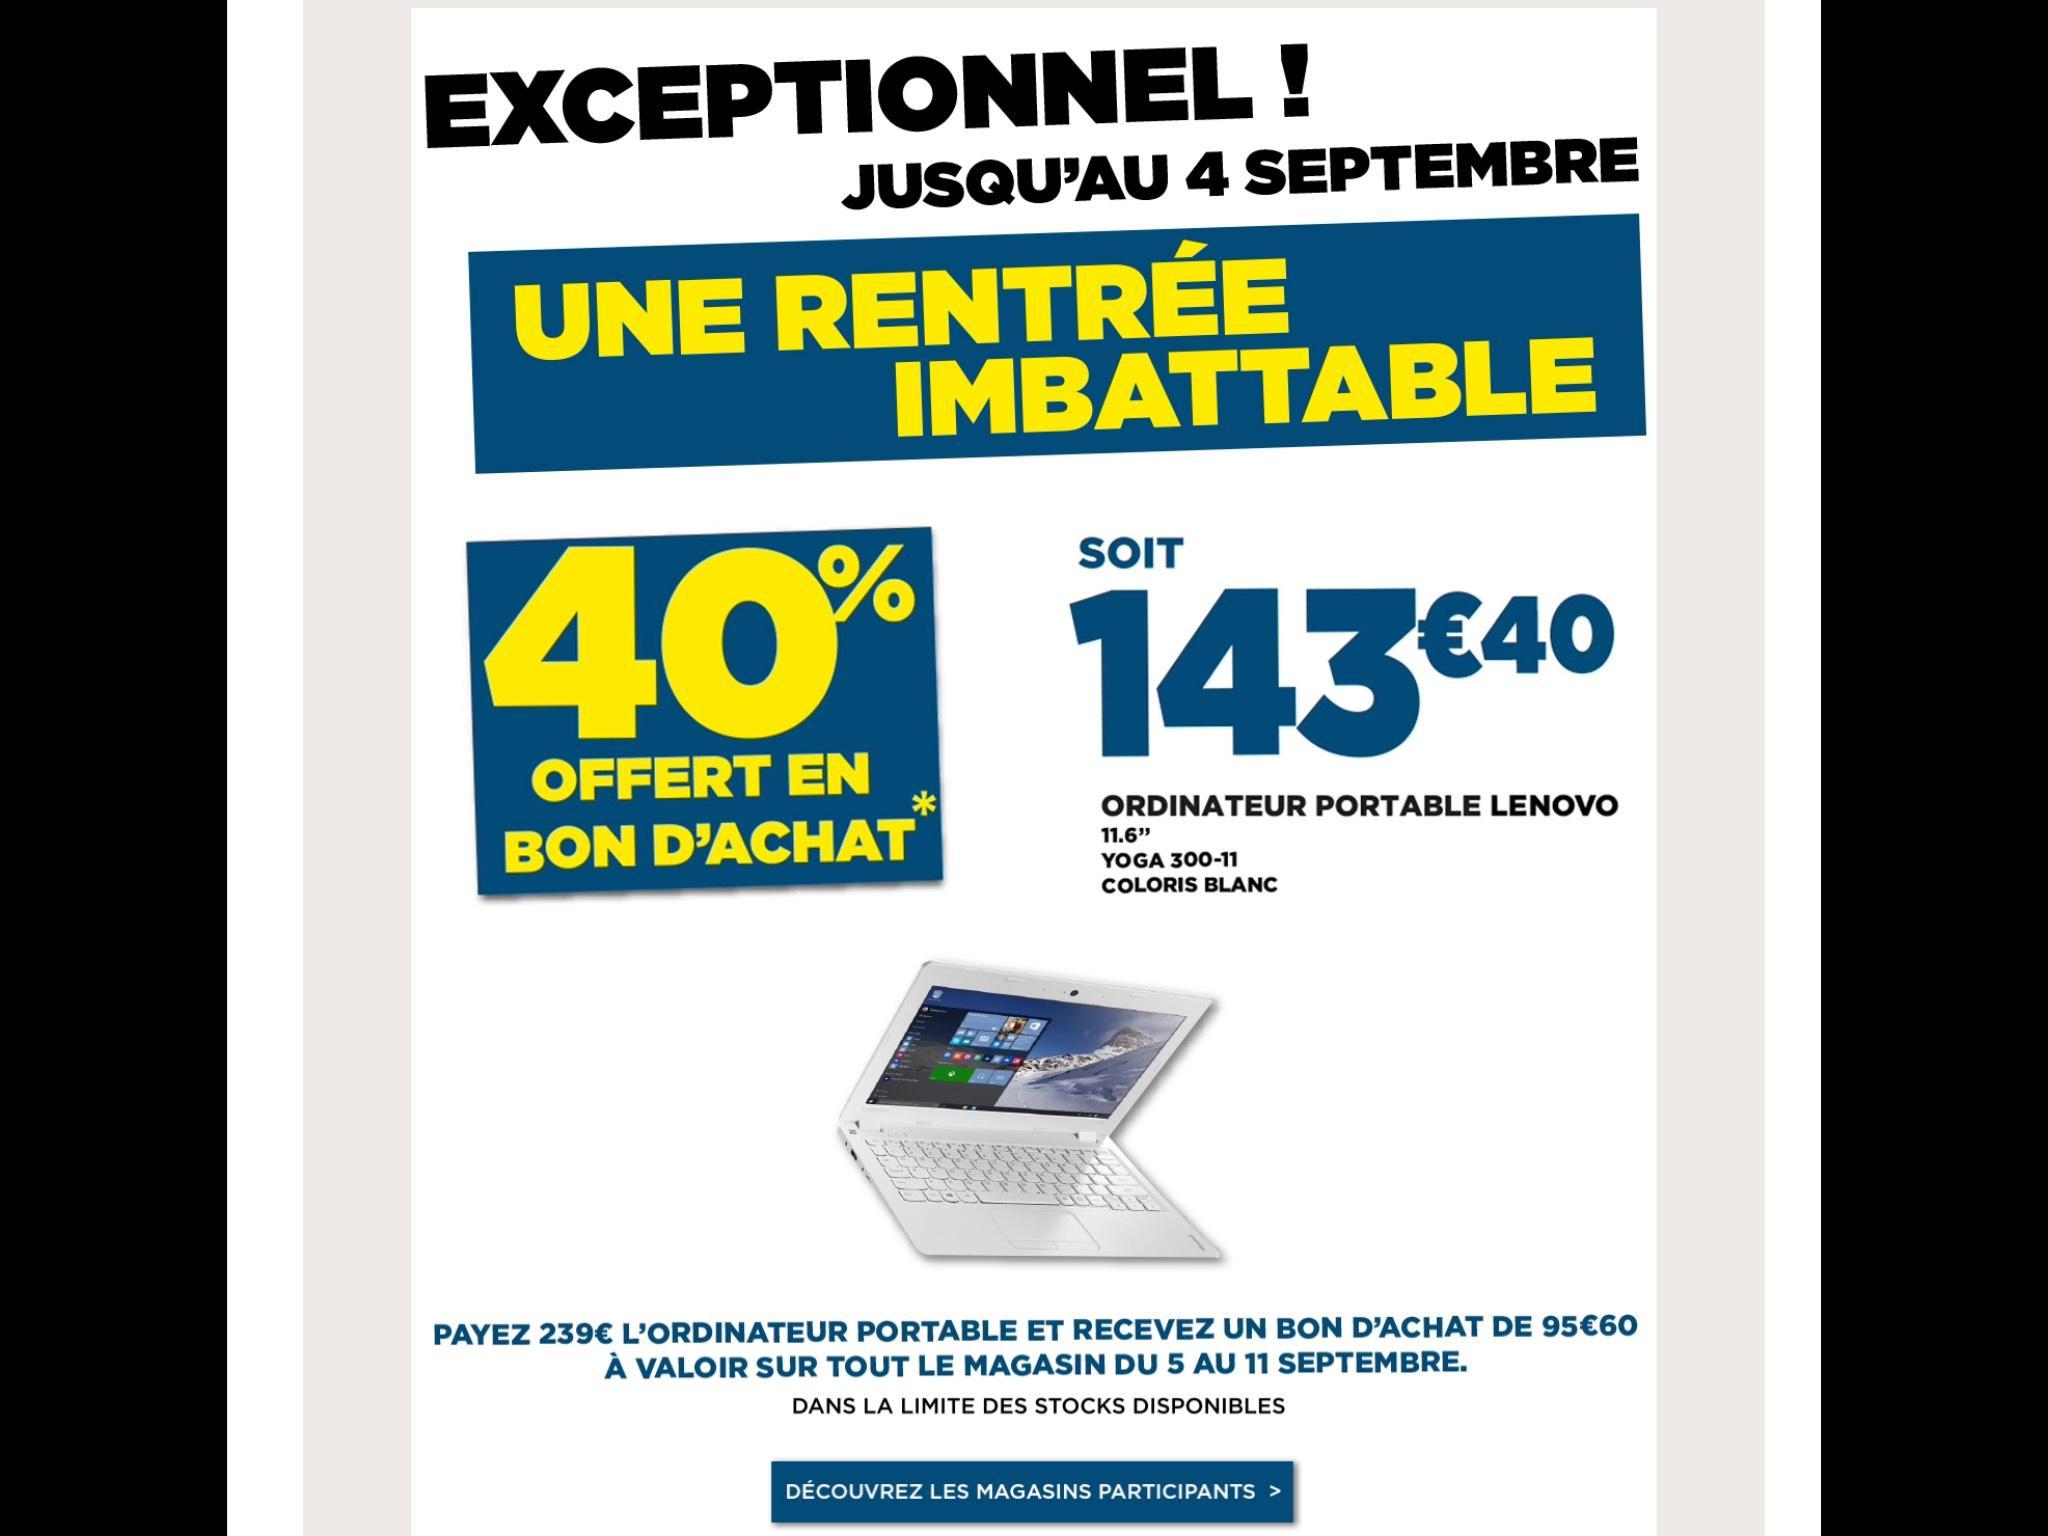 "PC Portable 11.6"" Lenovo Yoga 300-11 - HD, N3540, RAM 2Go, SSD 32Go, Windows 10 (Via 95,60€ en bon d'achat)"